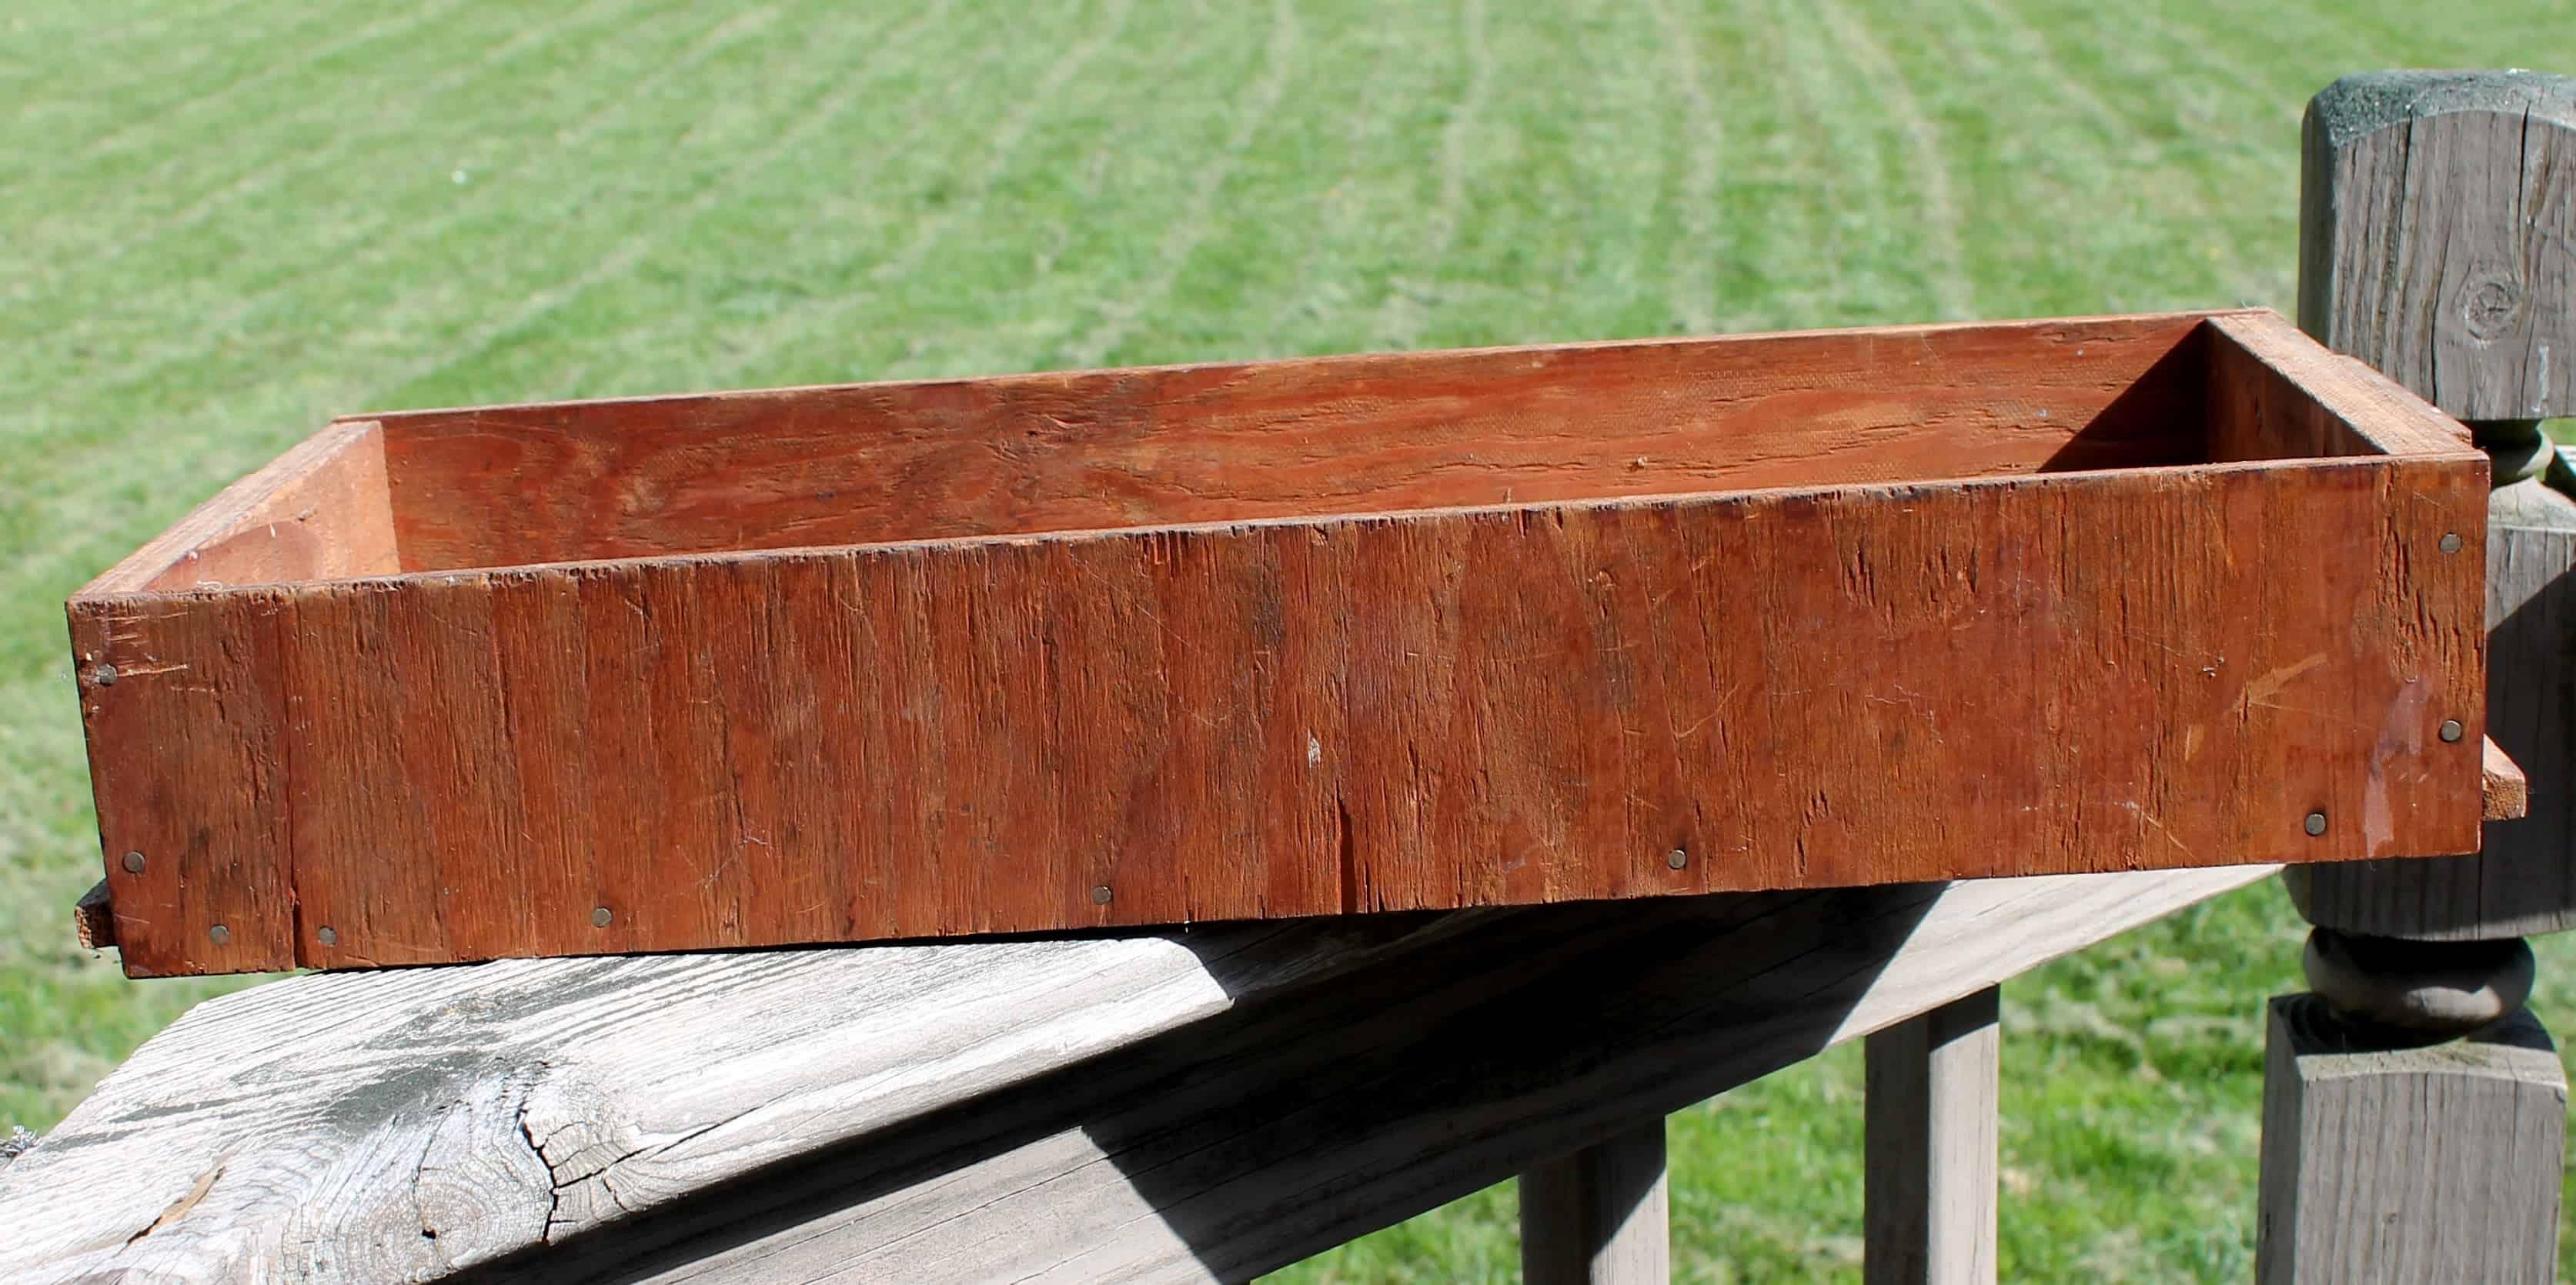 cruddy old box turned charming vintage tray adirondack heart